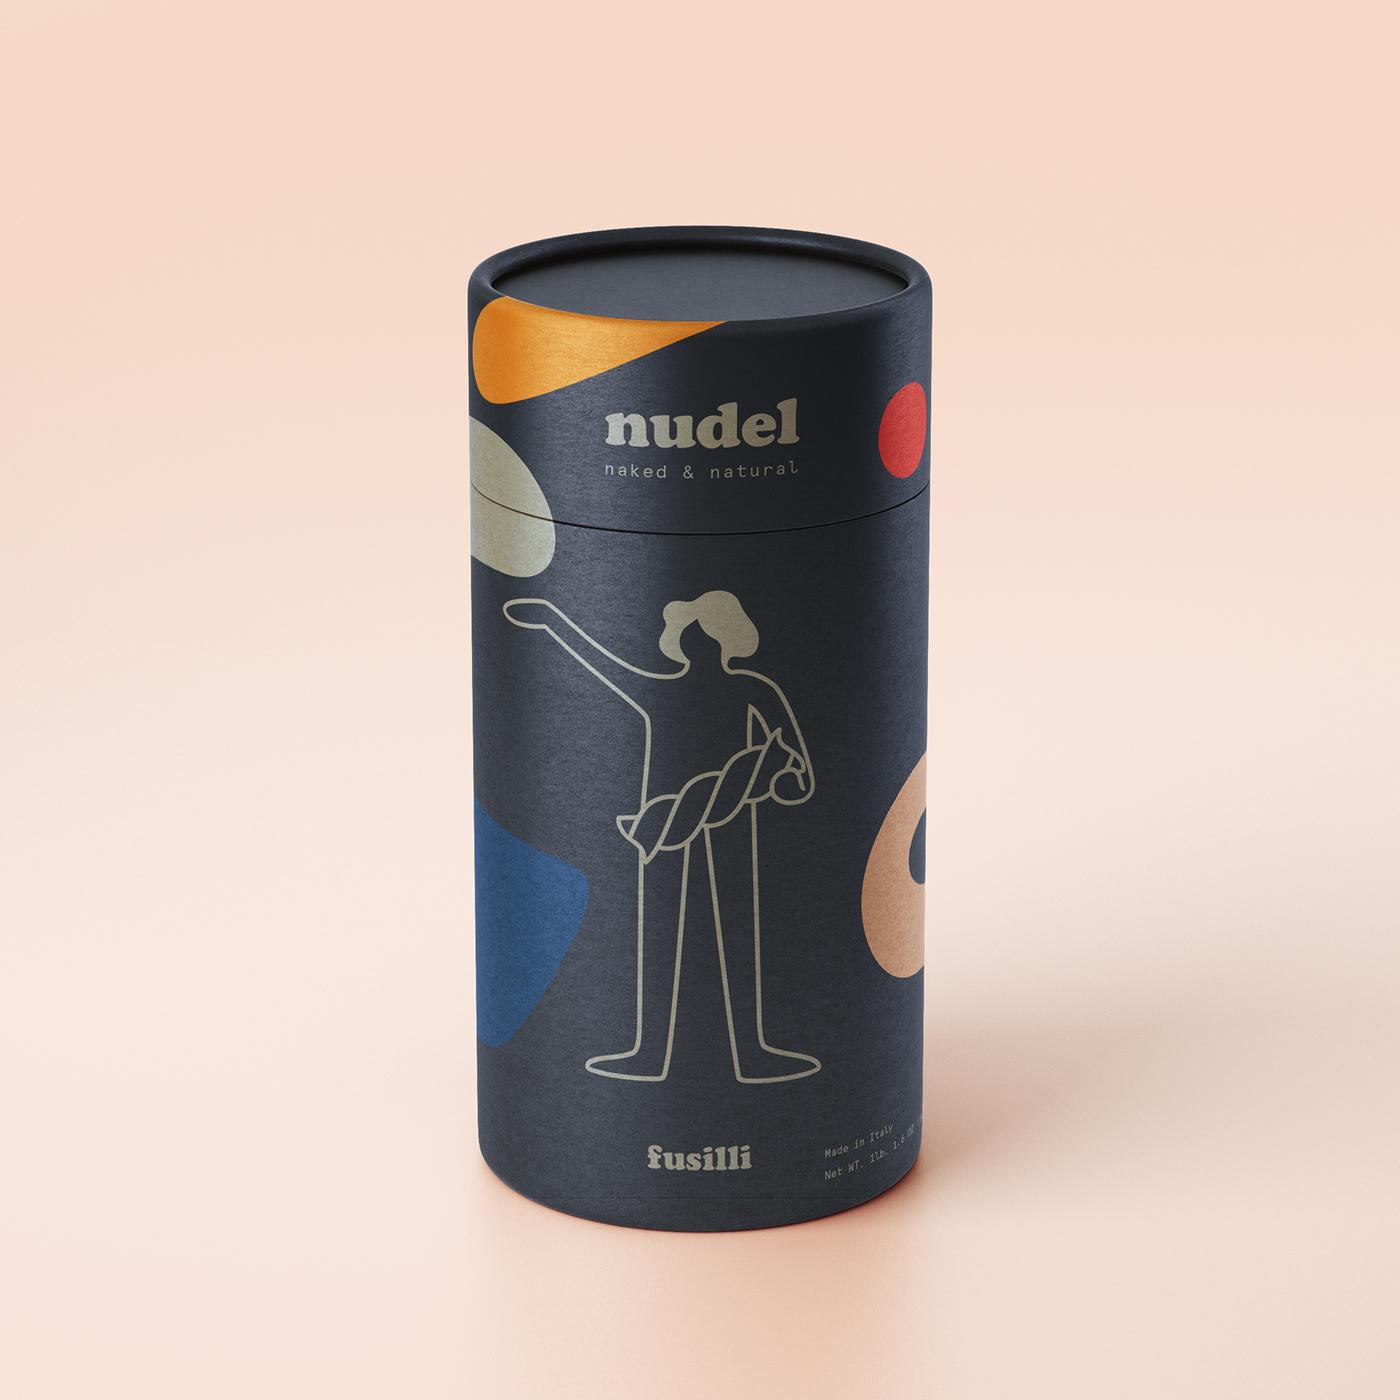 nudel naked natural noodles Brand Development people spices Pasta Food Packaging adobeawards